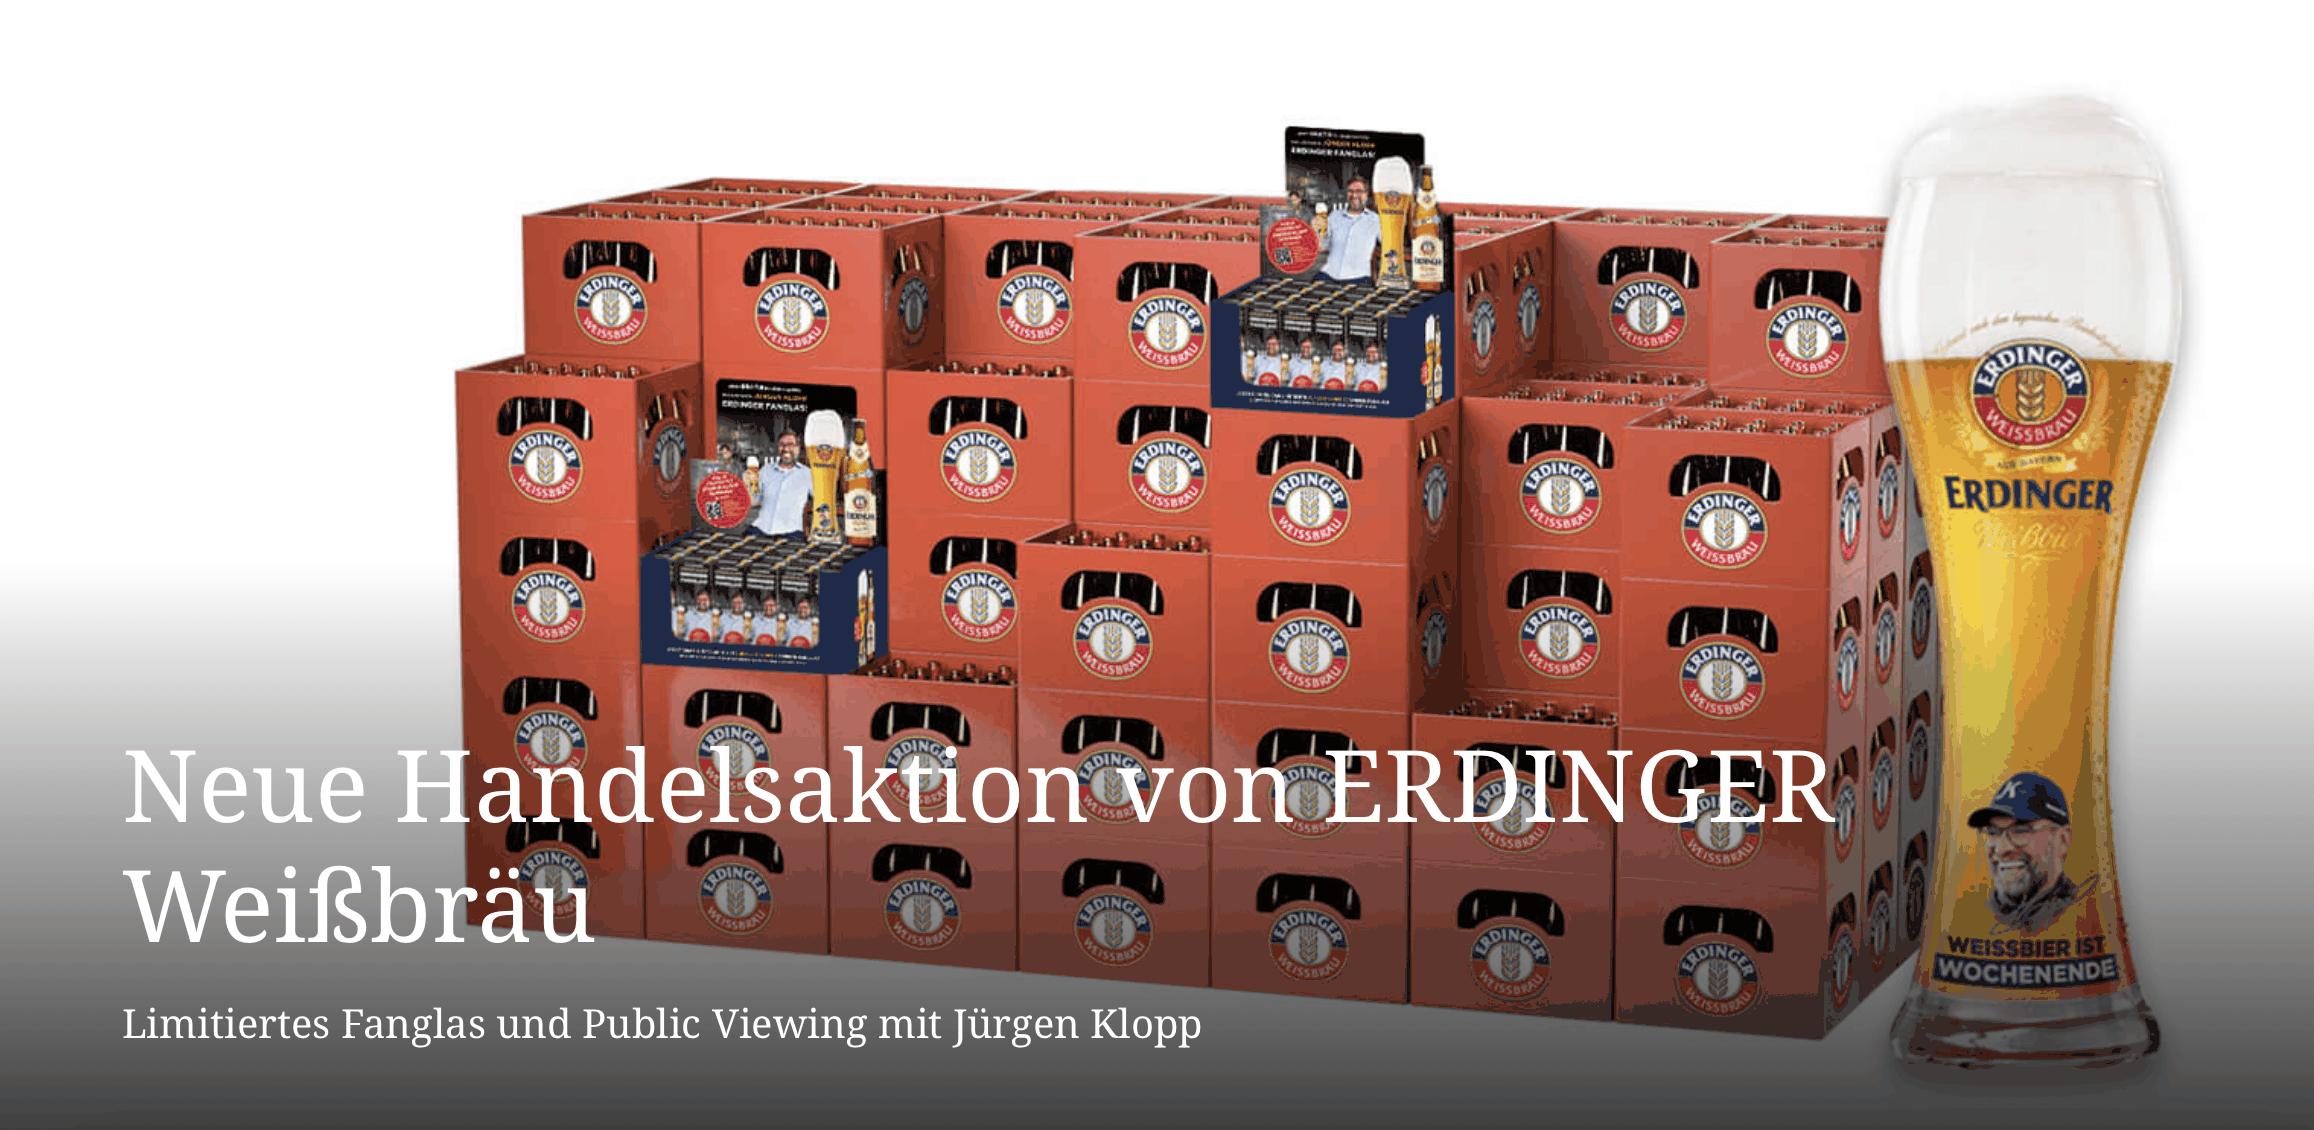 Erdinger POS-Zugabe-Promotions